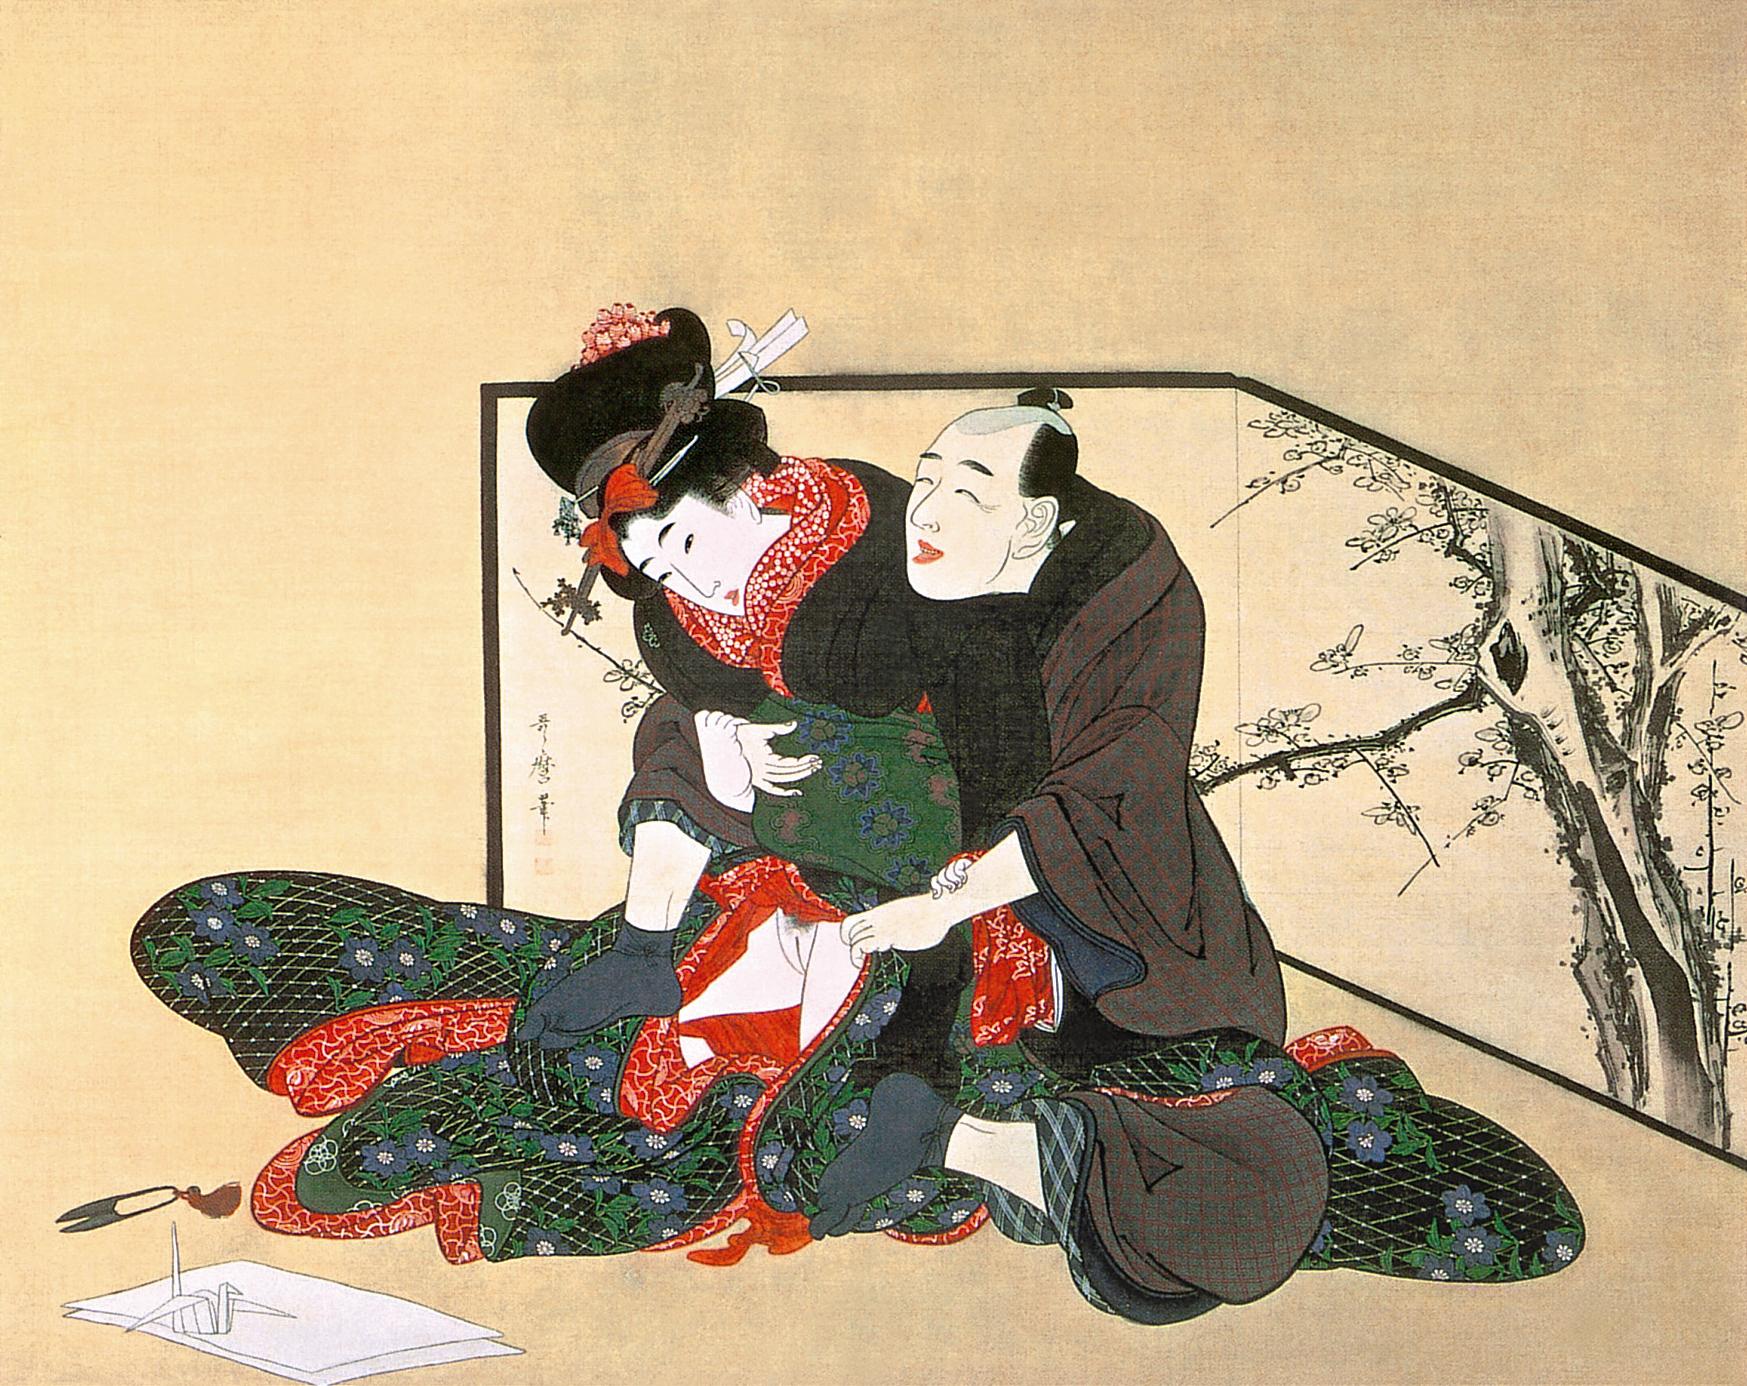 Kitagawa Utamaro, Man Seducing a Young Woman (Otoko to musume), 1801-1804. Ink and colour on silk, 70 x 55 cm, Tokushu Paper Mfg. Co., Ltd.